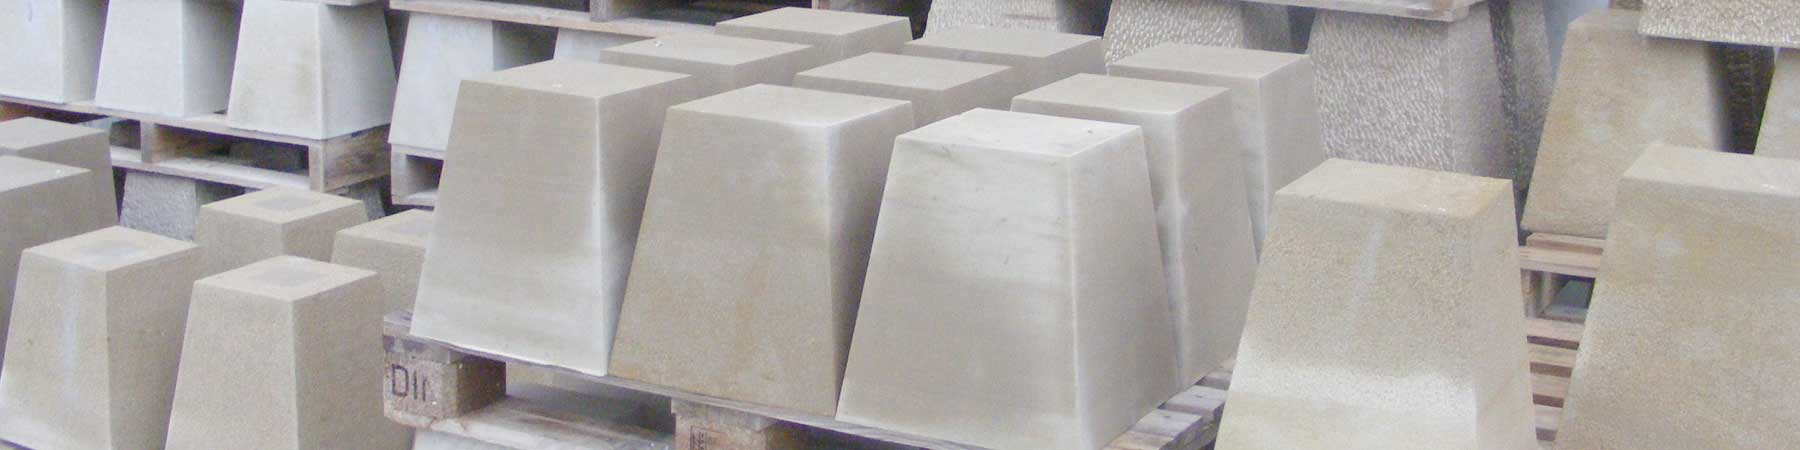 Basas de piedra natural